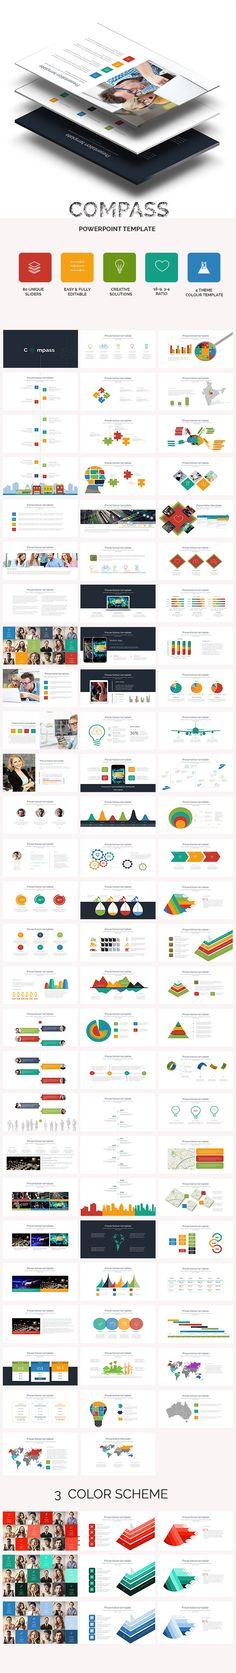 Compass Business PowerPoint Presentation Template #powerpoint #design #slides Download: http://graphicriver.net/item/compass-business-powerpoint-presentation-template/10862478?ref=ksioks